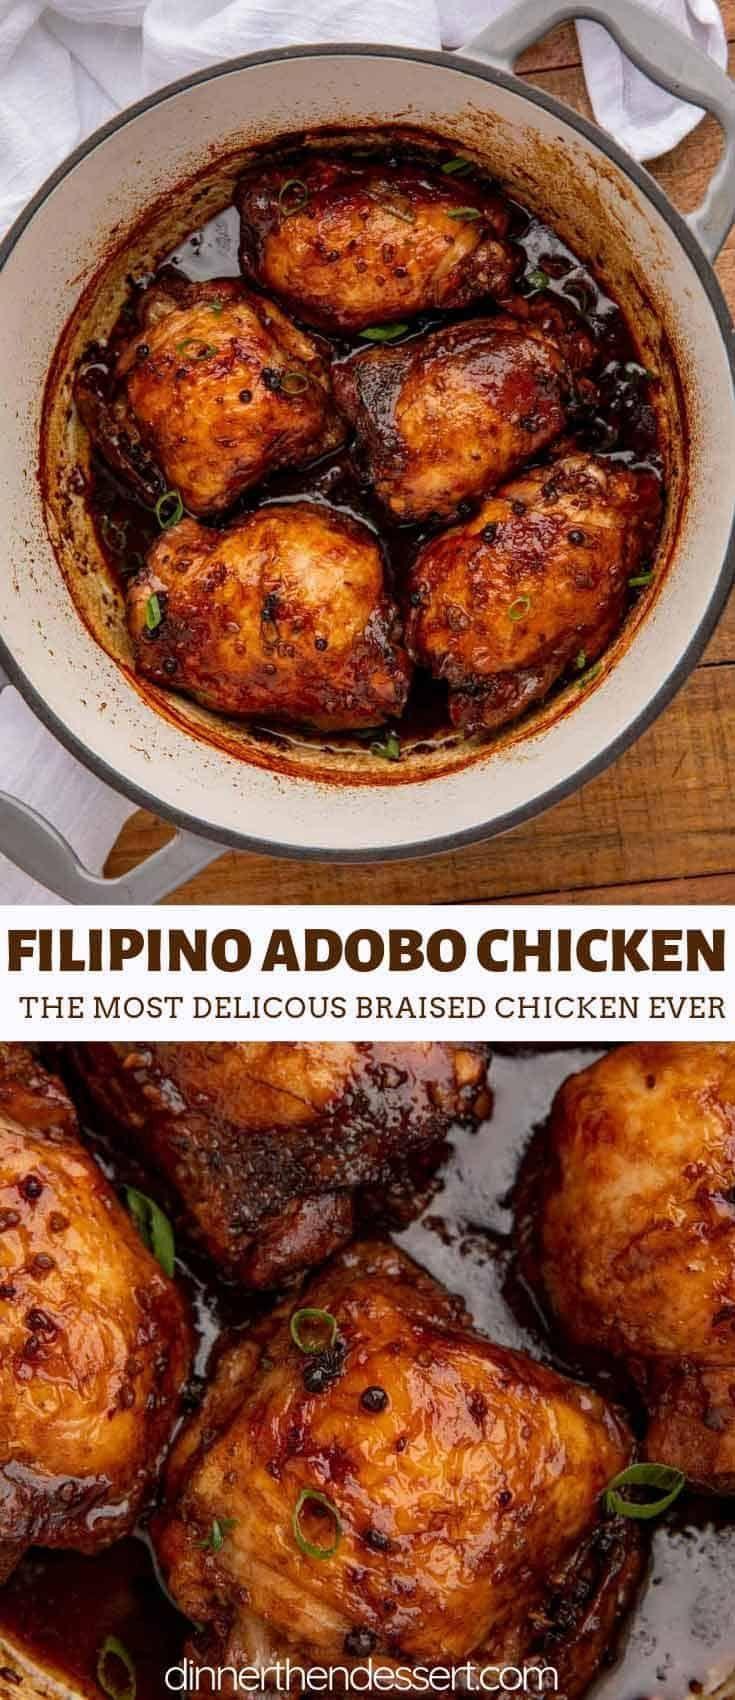 Adobo Chicken is a classic Filipino recipe ... - #Adobo #asian #Chicken # ... - #Adobo #Asian